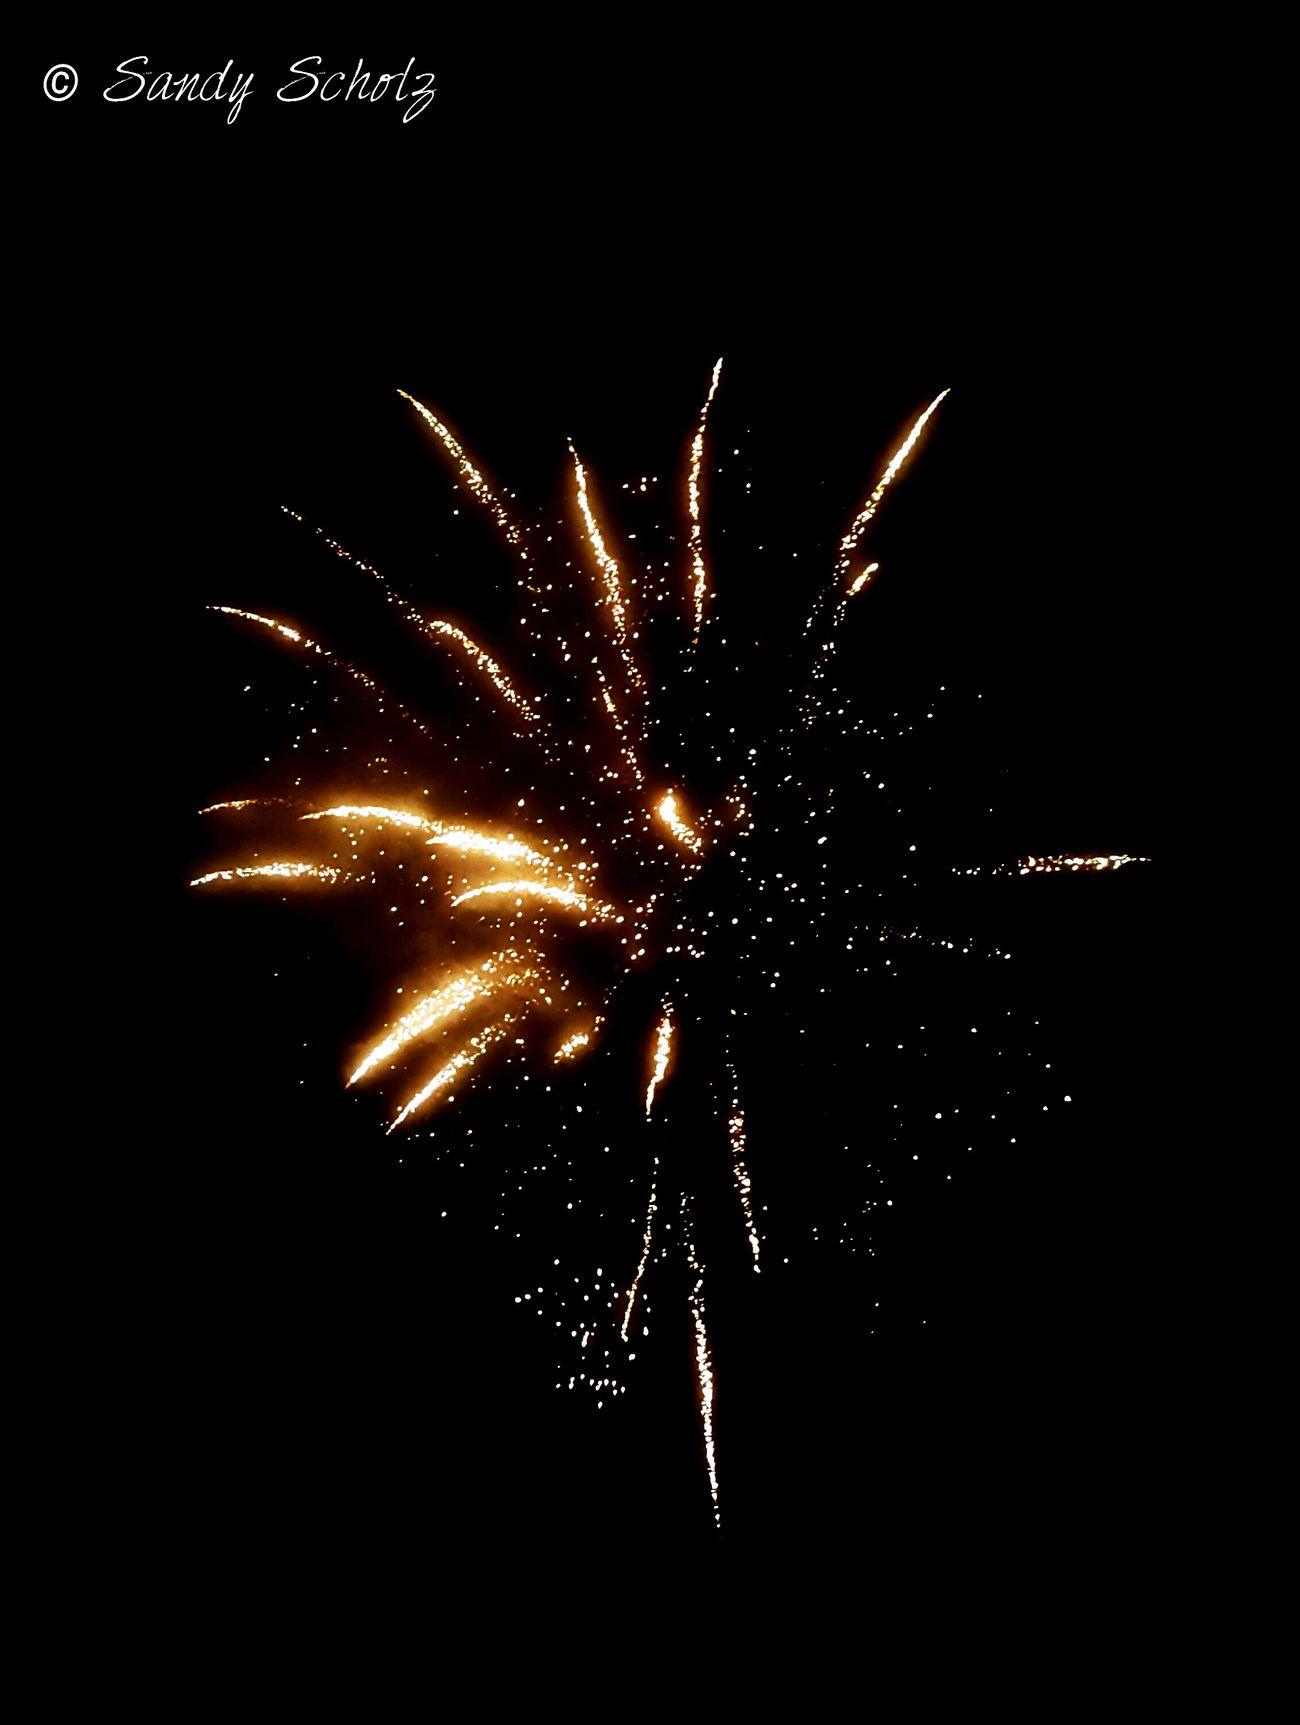 Exploding Firework Fireworks Fireworksphotography Fireworks In The Sky Fireworks❤ Fireworks Photography GERMANY🇩🇪DEUTSCHERLAND@ Bayern Germany Deutschland Germany Bayern StreamzooVille Streamzoofamily StreamzooPics Streamzoo Family Eyeemphotography Firework Display Happy New Year Happy New Year! Happy New Year 2017 Happy New Year Happy New Year 2017! Happy New Years  Happy New Year!!!